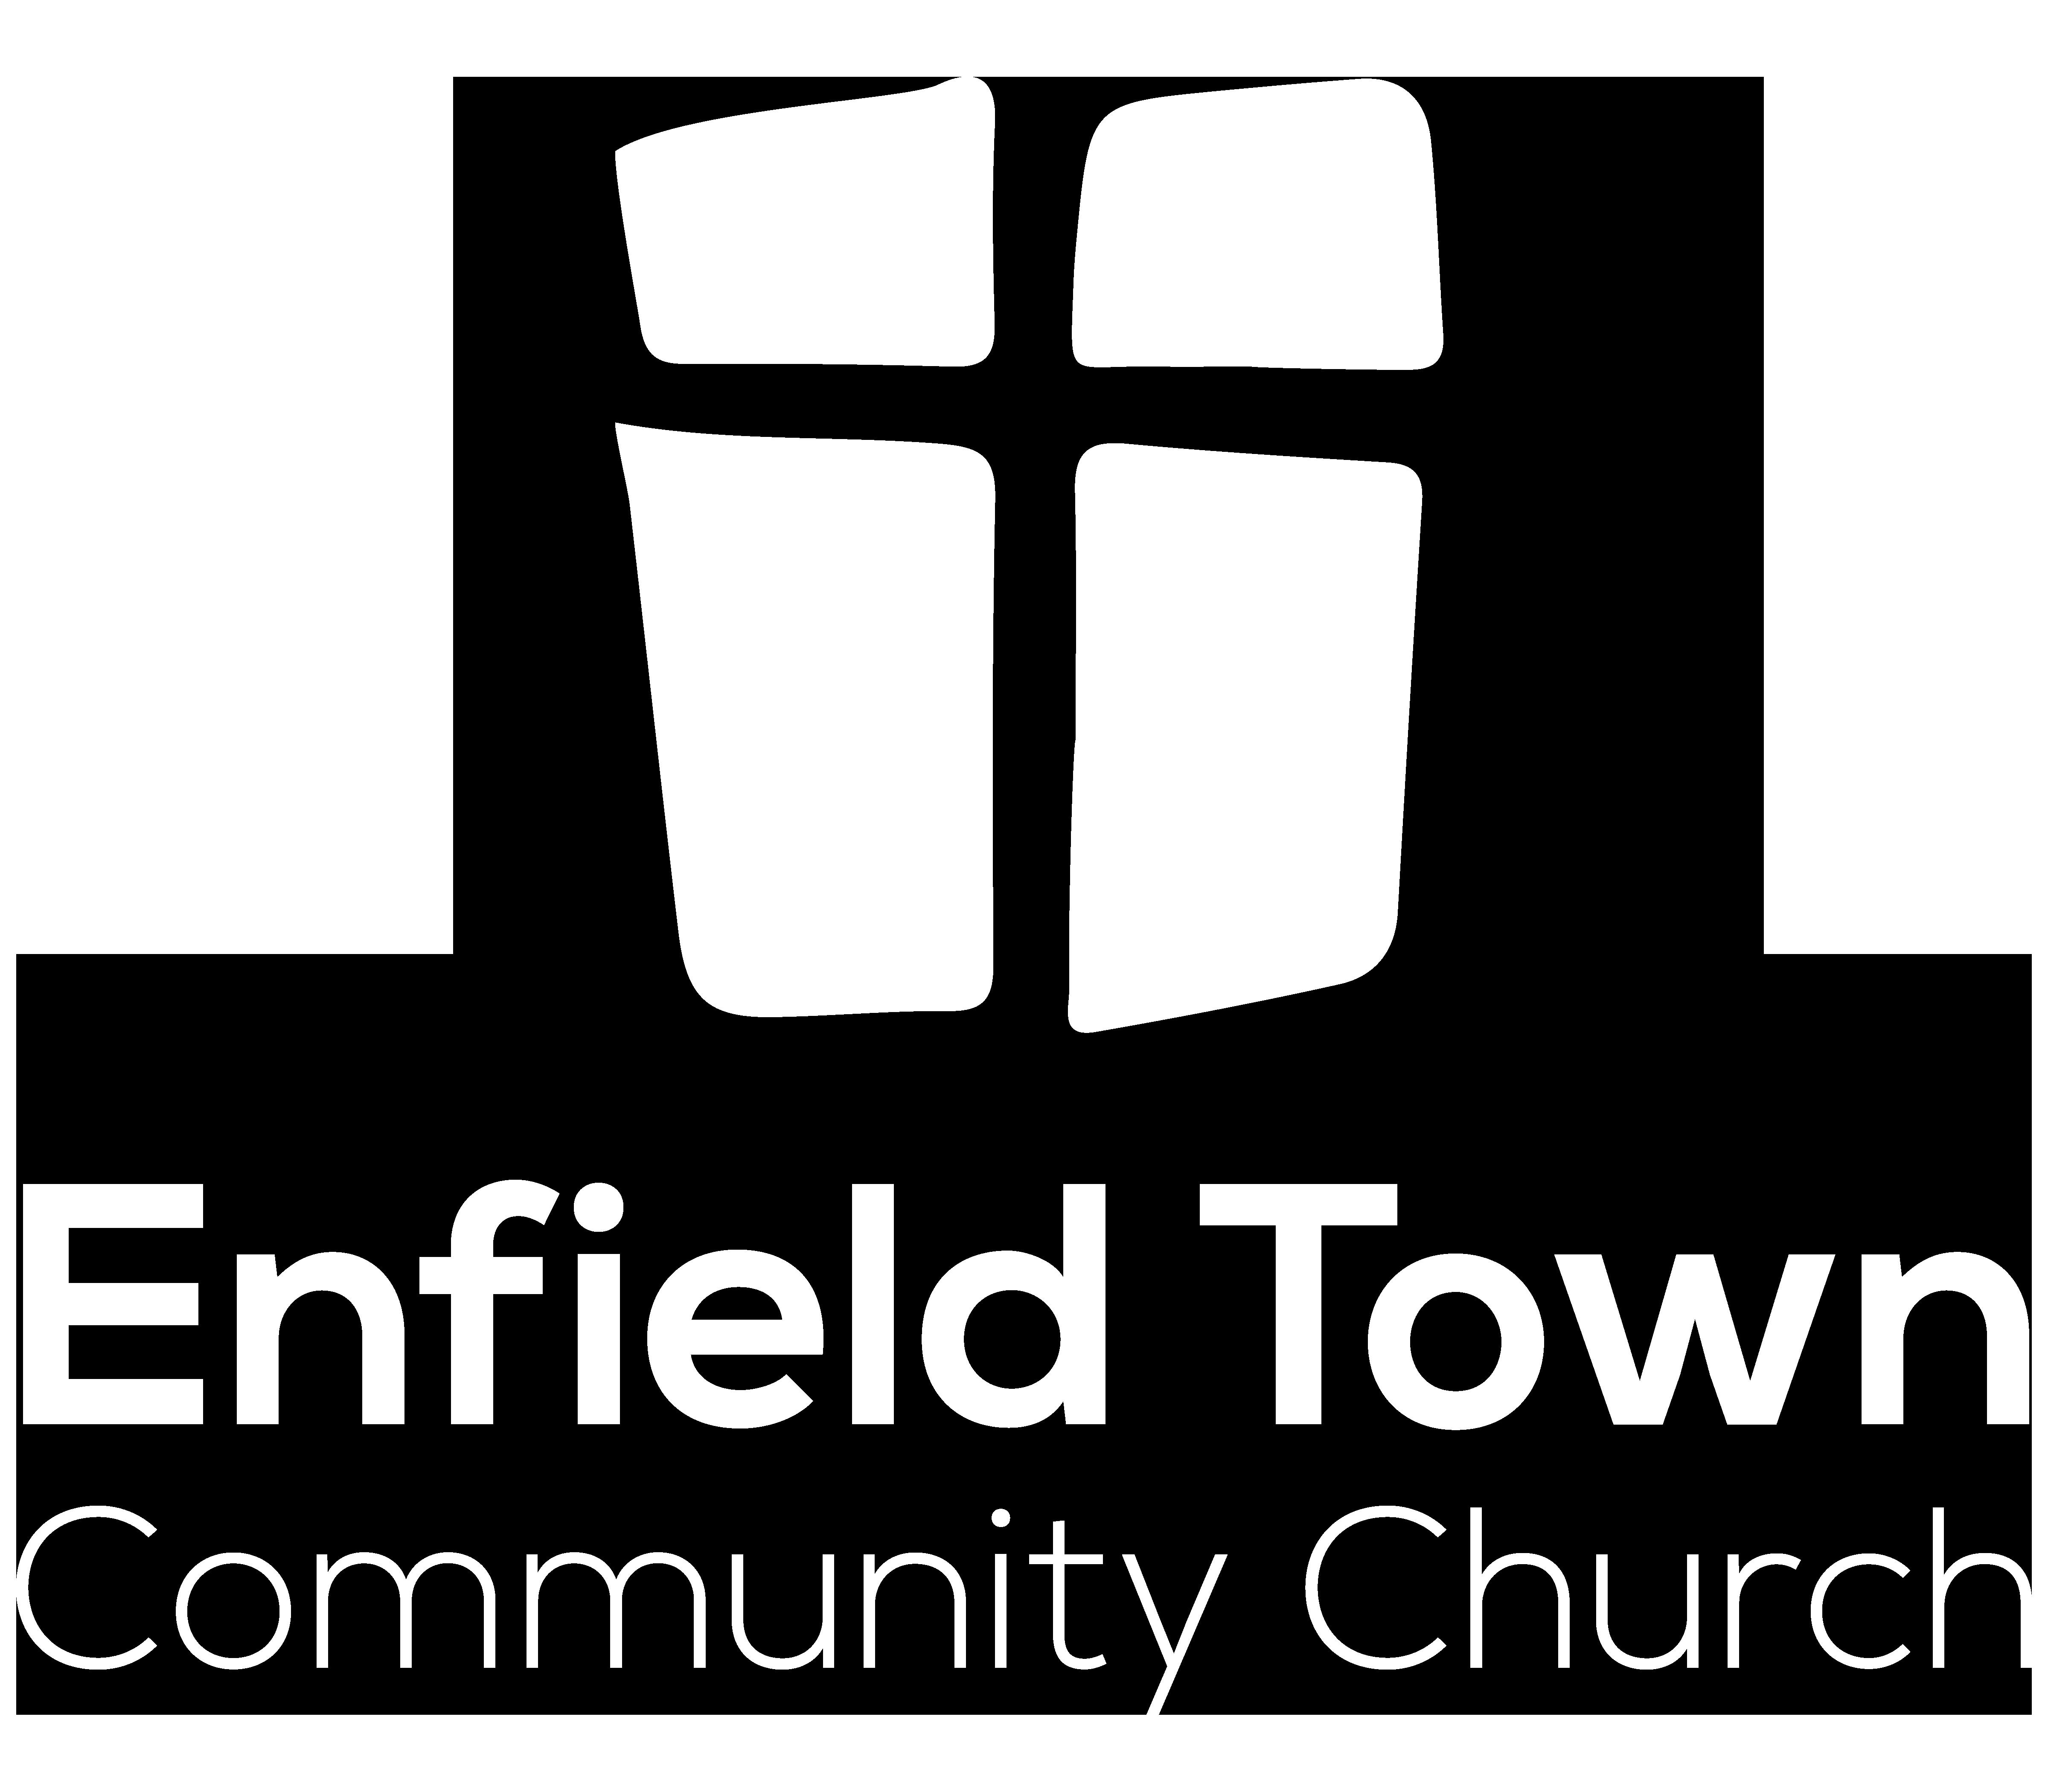 Enfield Town Community Church